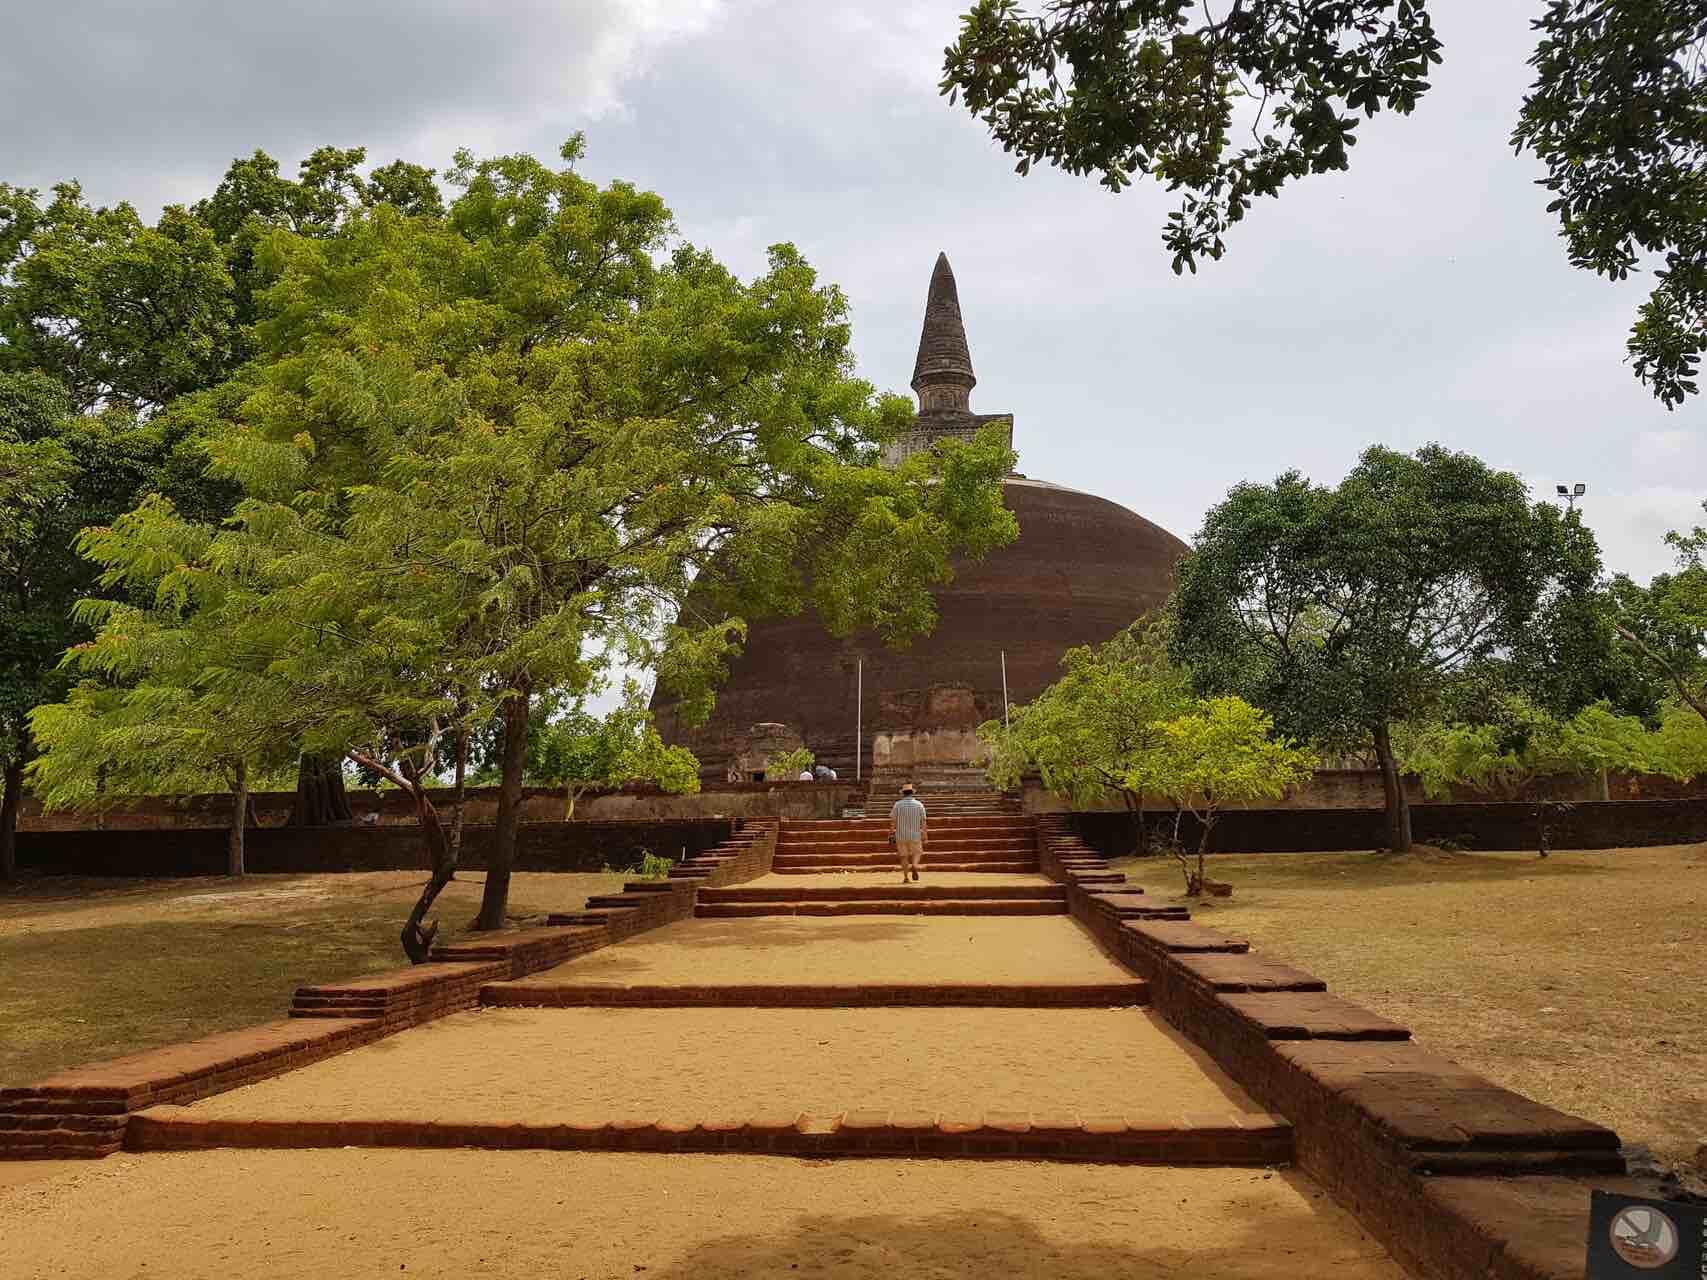 sri-lanka-cutlural-triangle-polonnaruwa-holiday-review-feedback-invite-to-paradise-quentin-kate-hulm.jpg